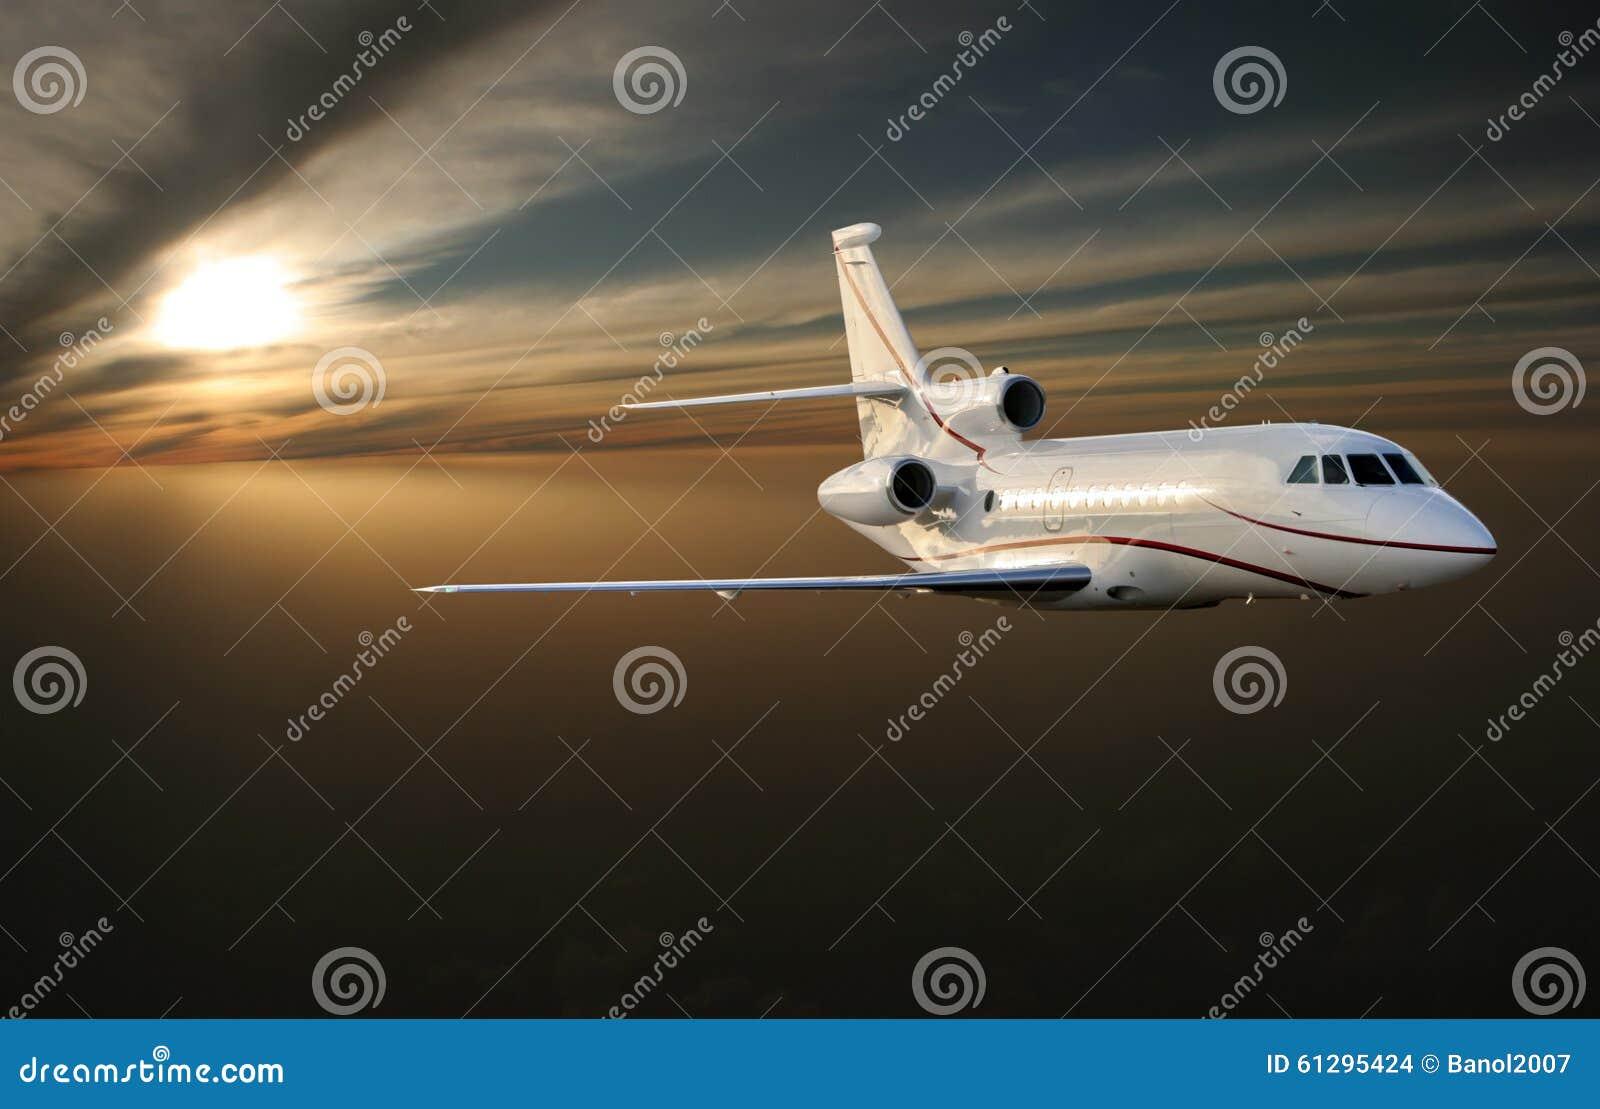 Volo di Ðœorning Æreo a reazione di lusso sopra terra